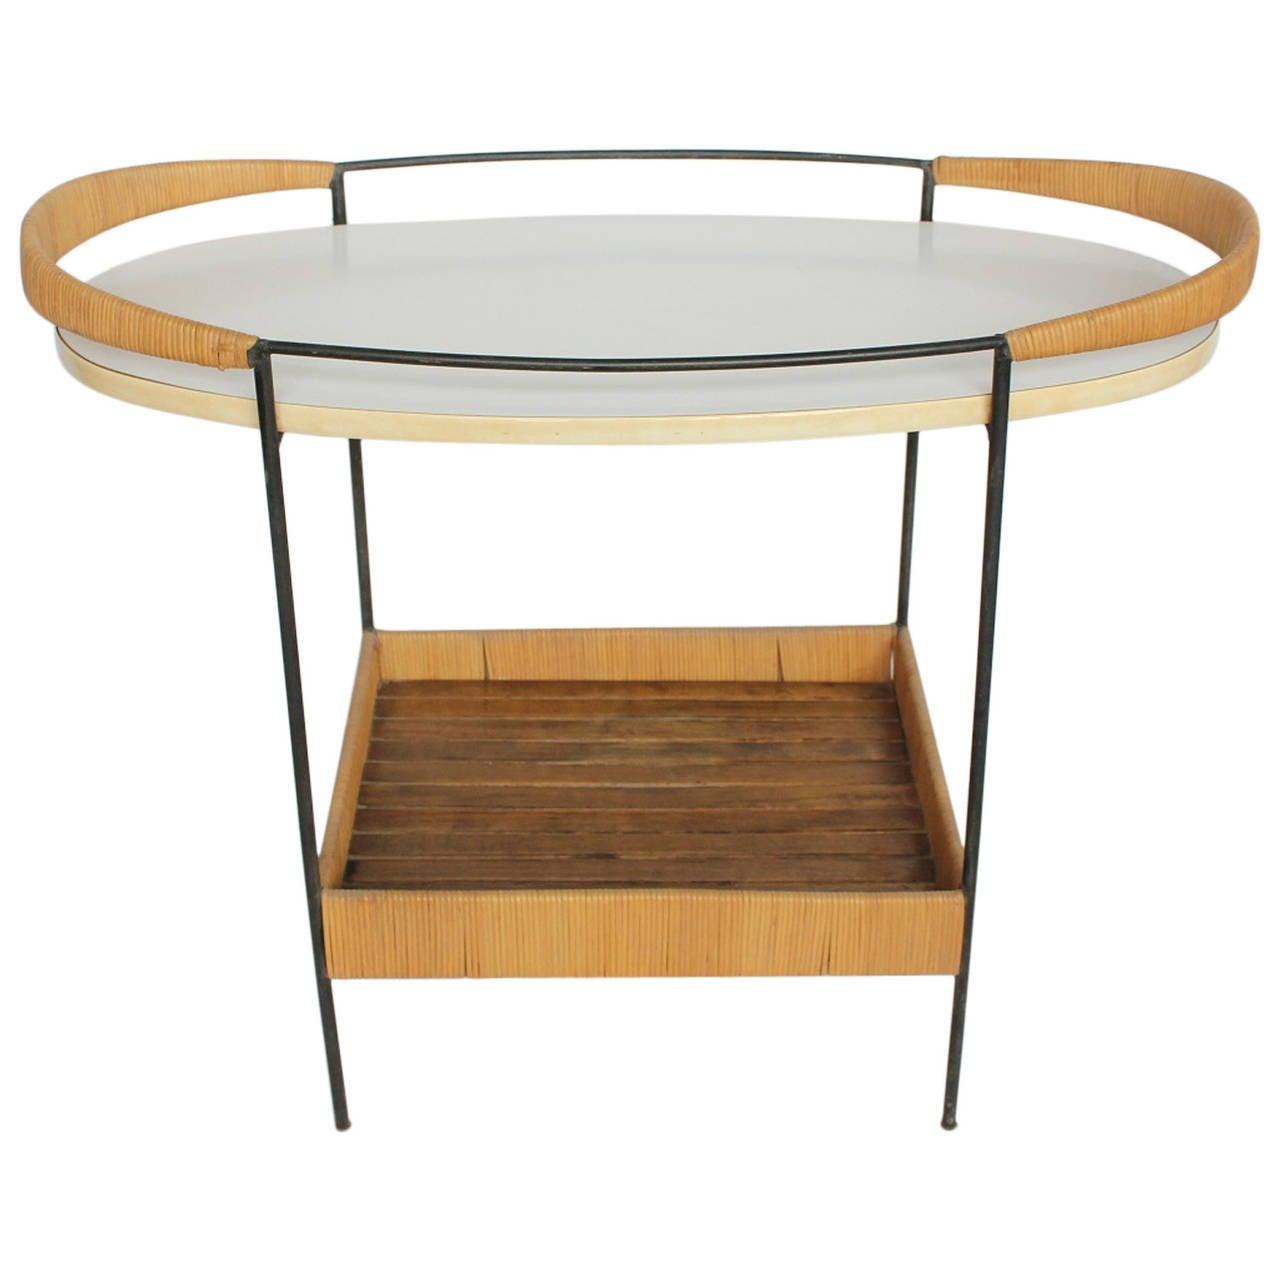 mid century bar cart by arthur umanoff for sale at 1stdibs. Black Bedroom Furniture Sets. Home Design Ideas